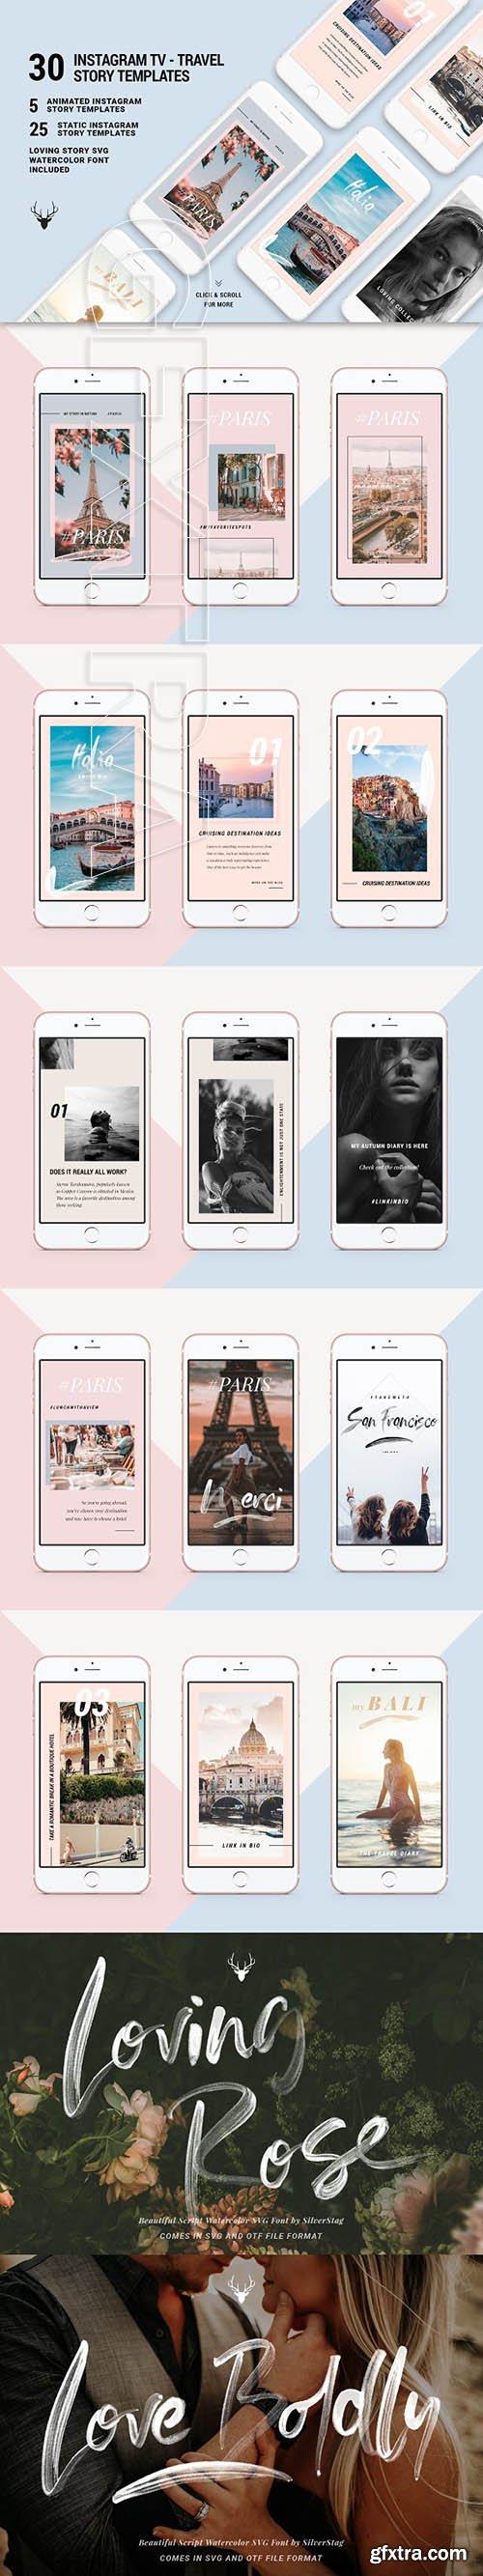 CreativeMarket - IGTV - ANIMATED Instagram Stories 2848300